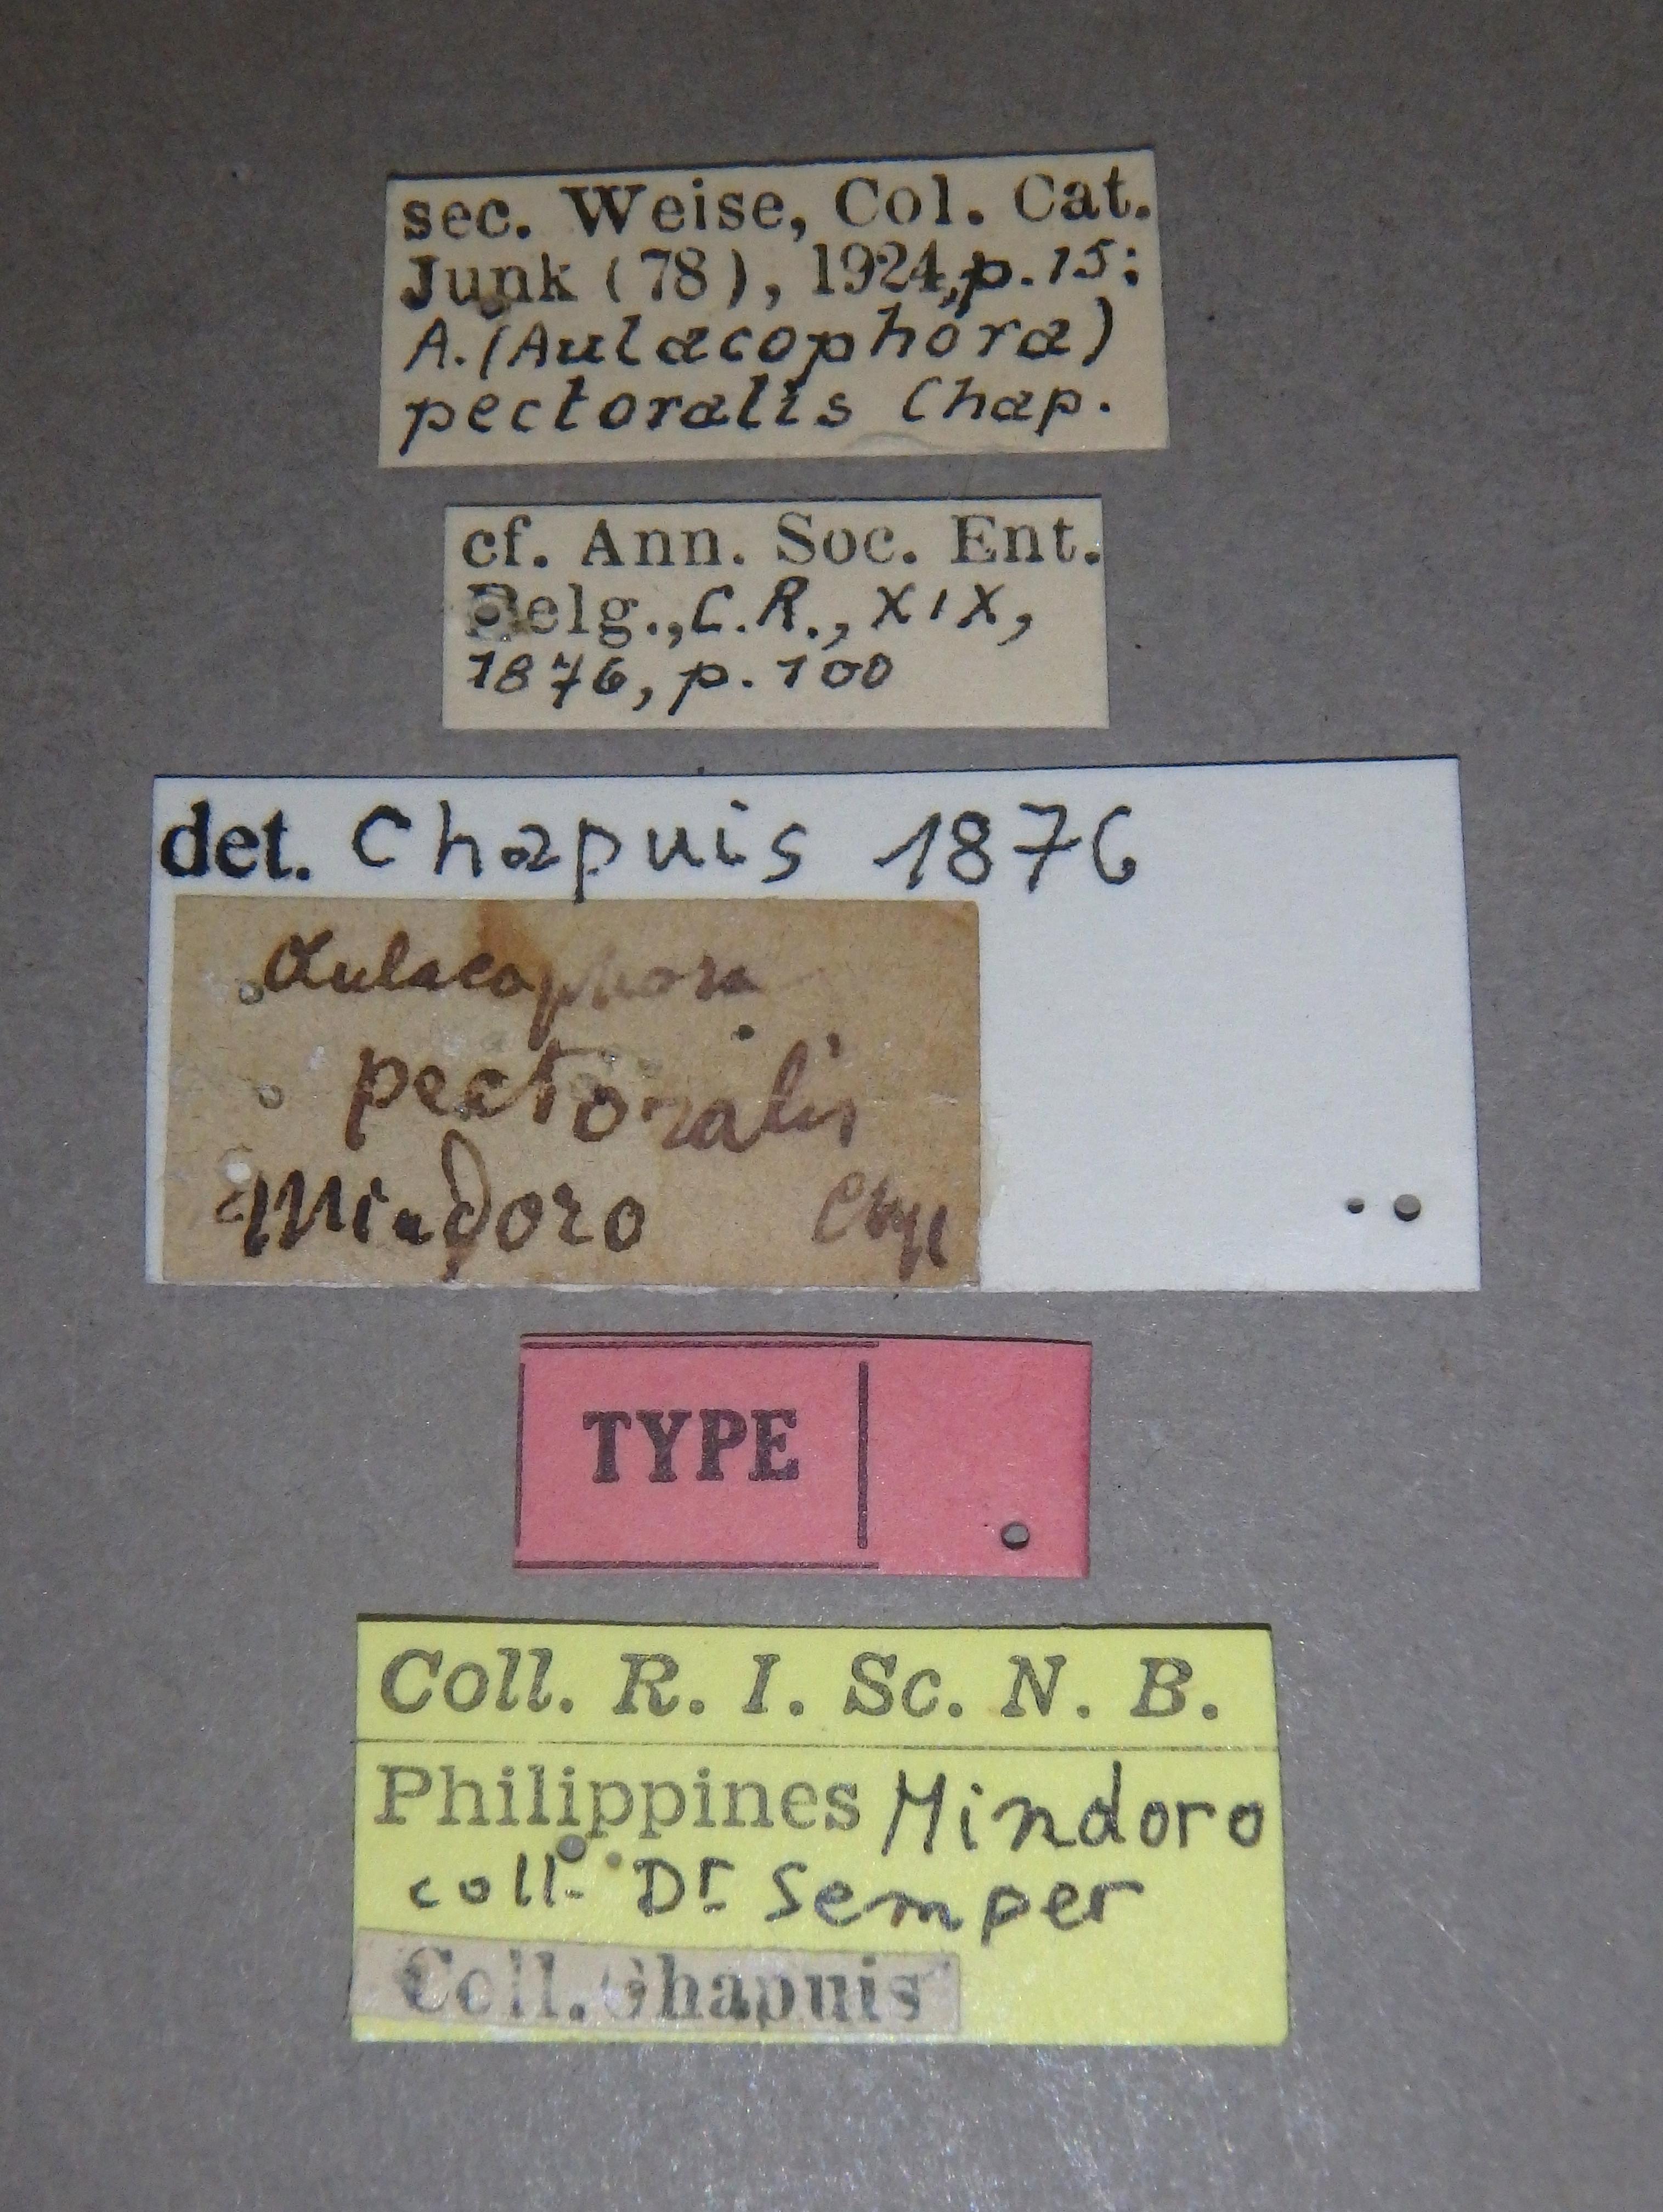 Aulacophora (Aulacophora) pectoralis t Lb.JPG